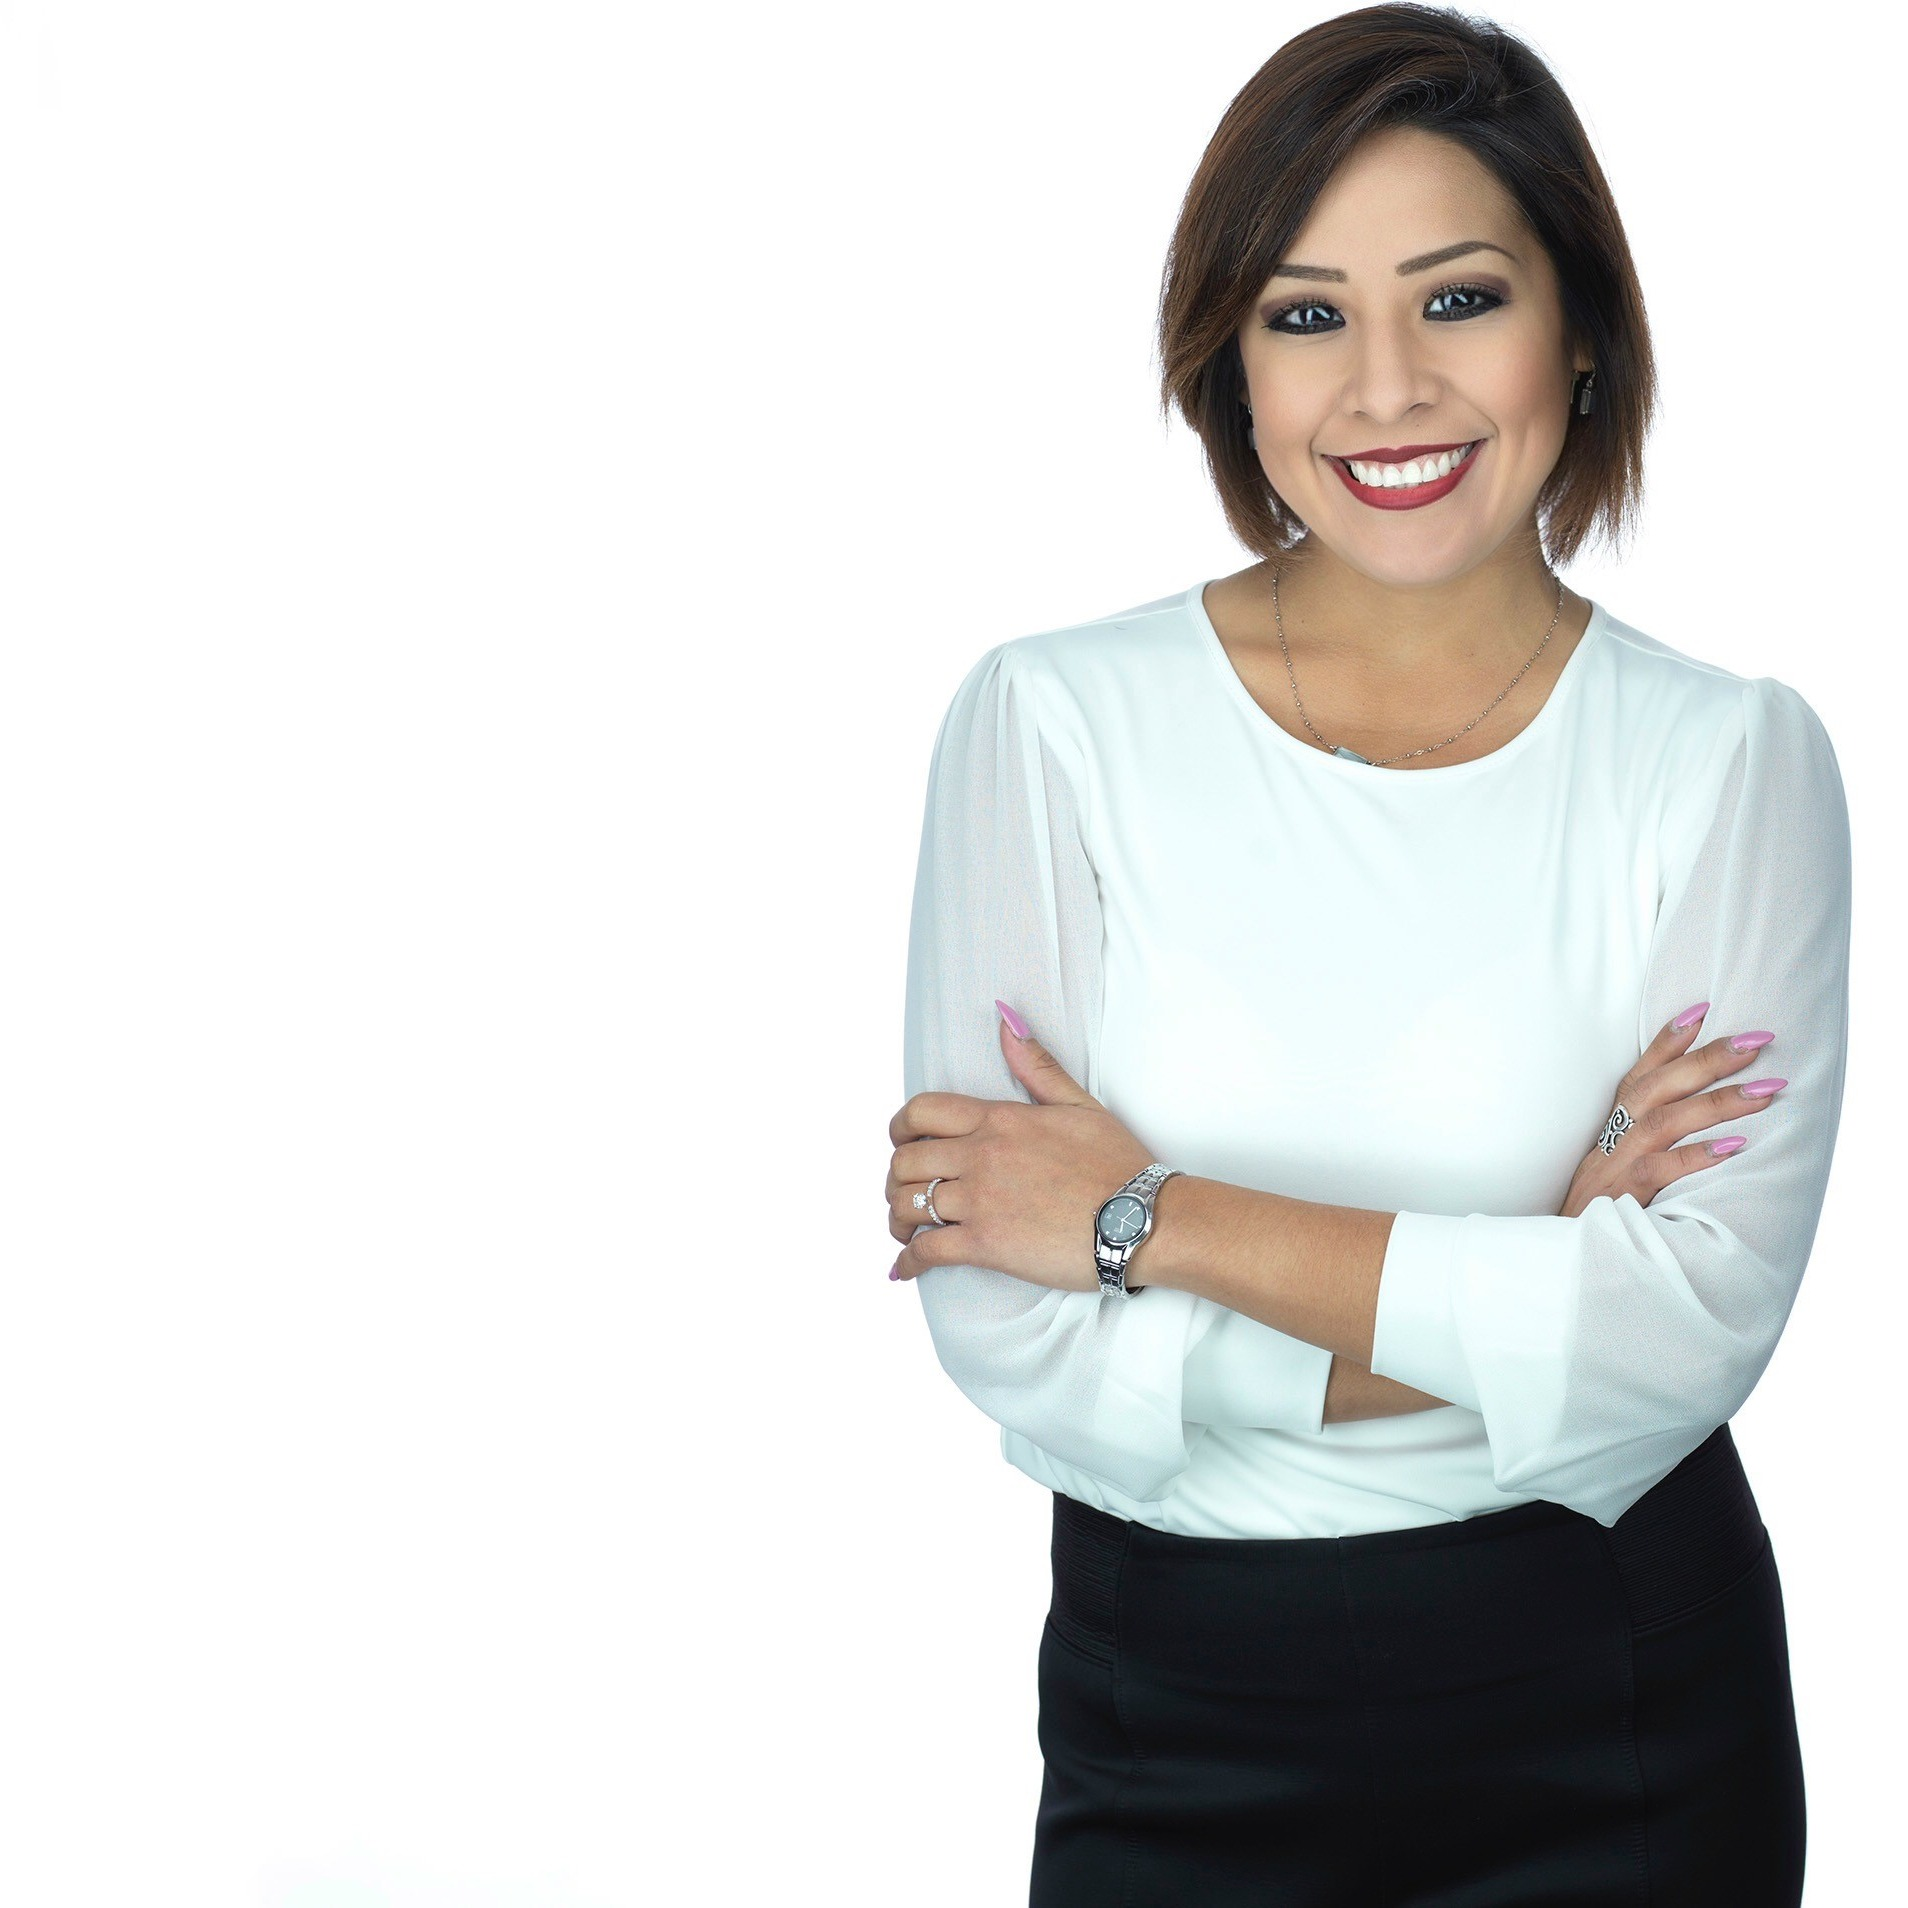 Tricia Hernandez